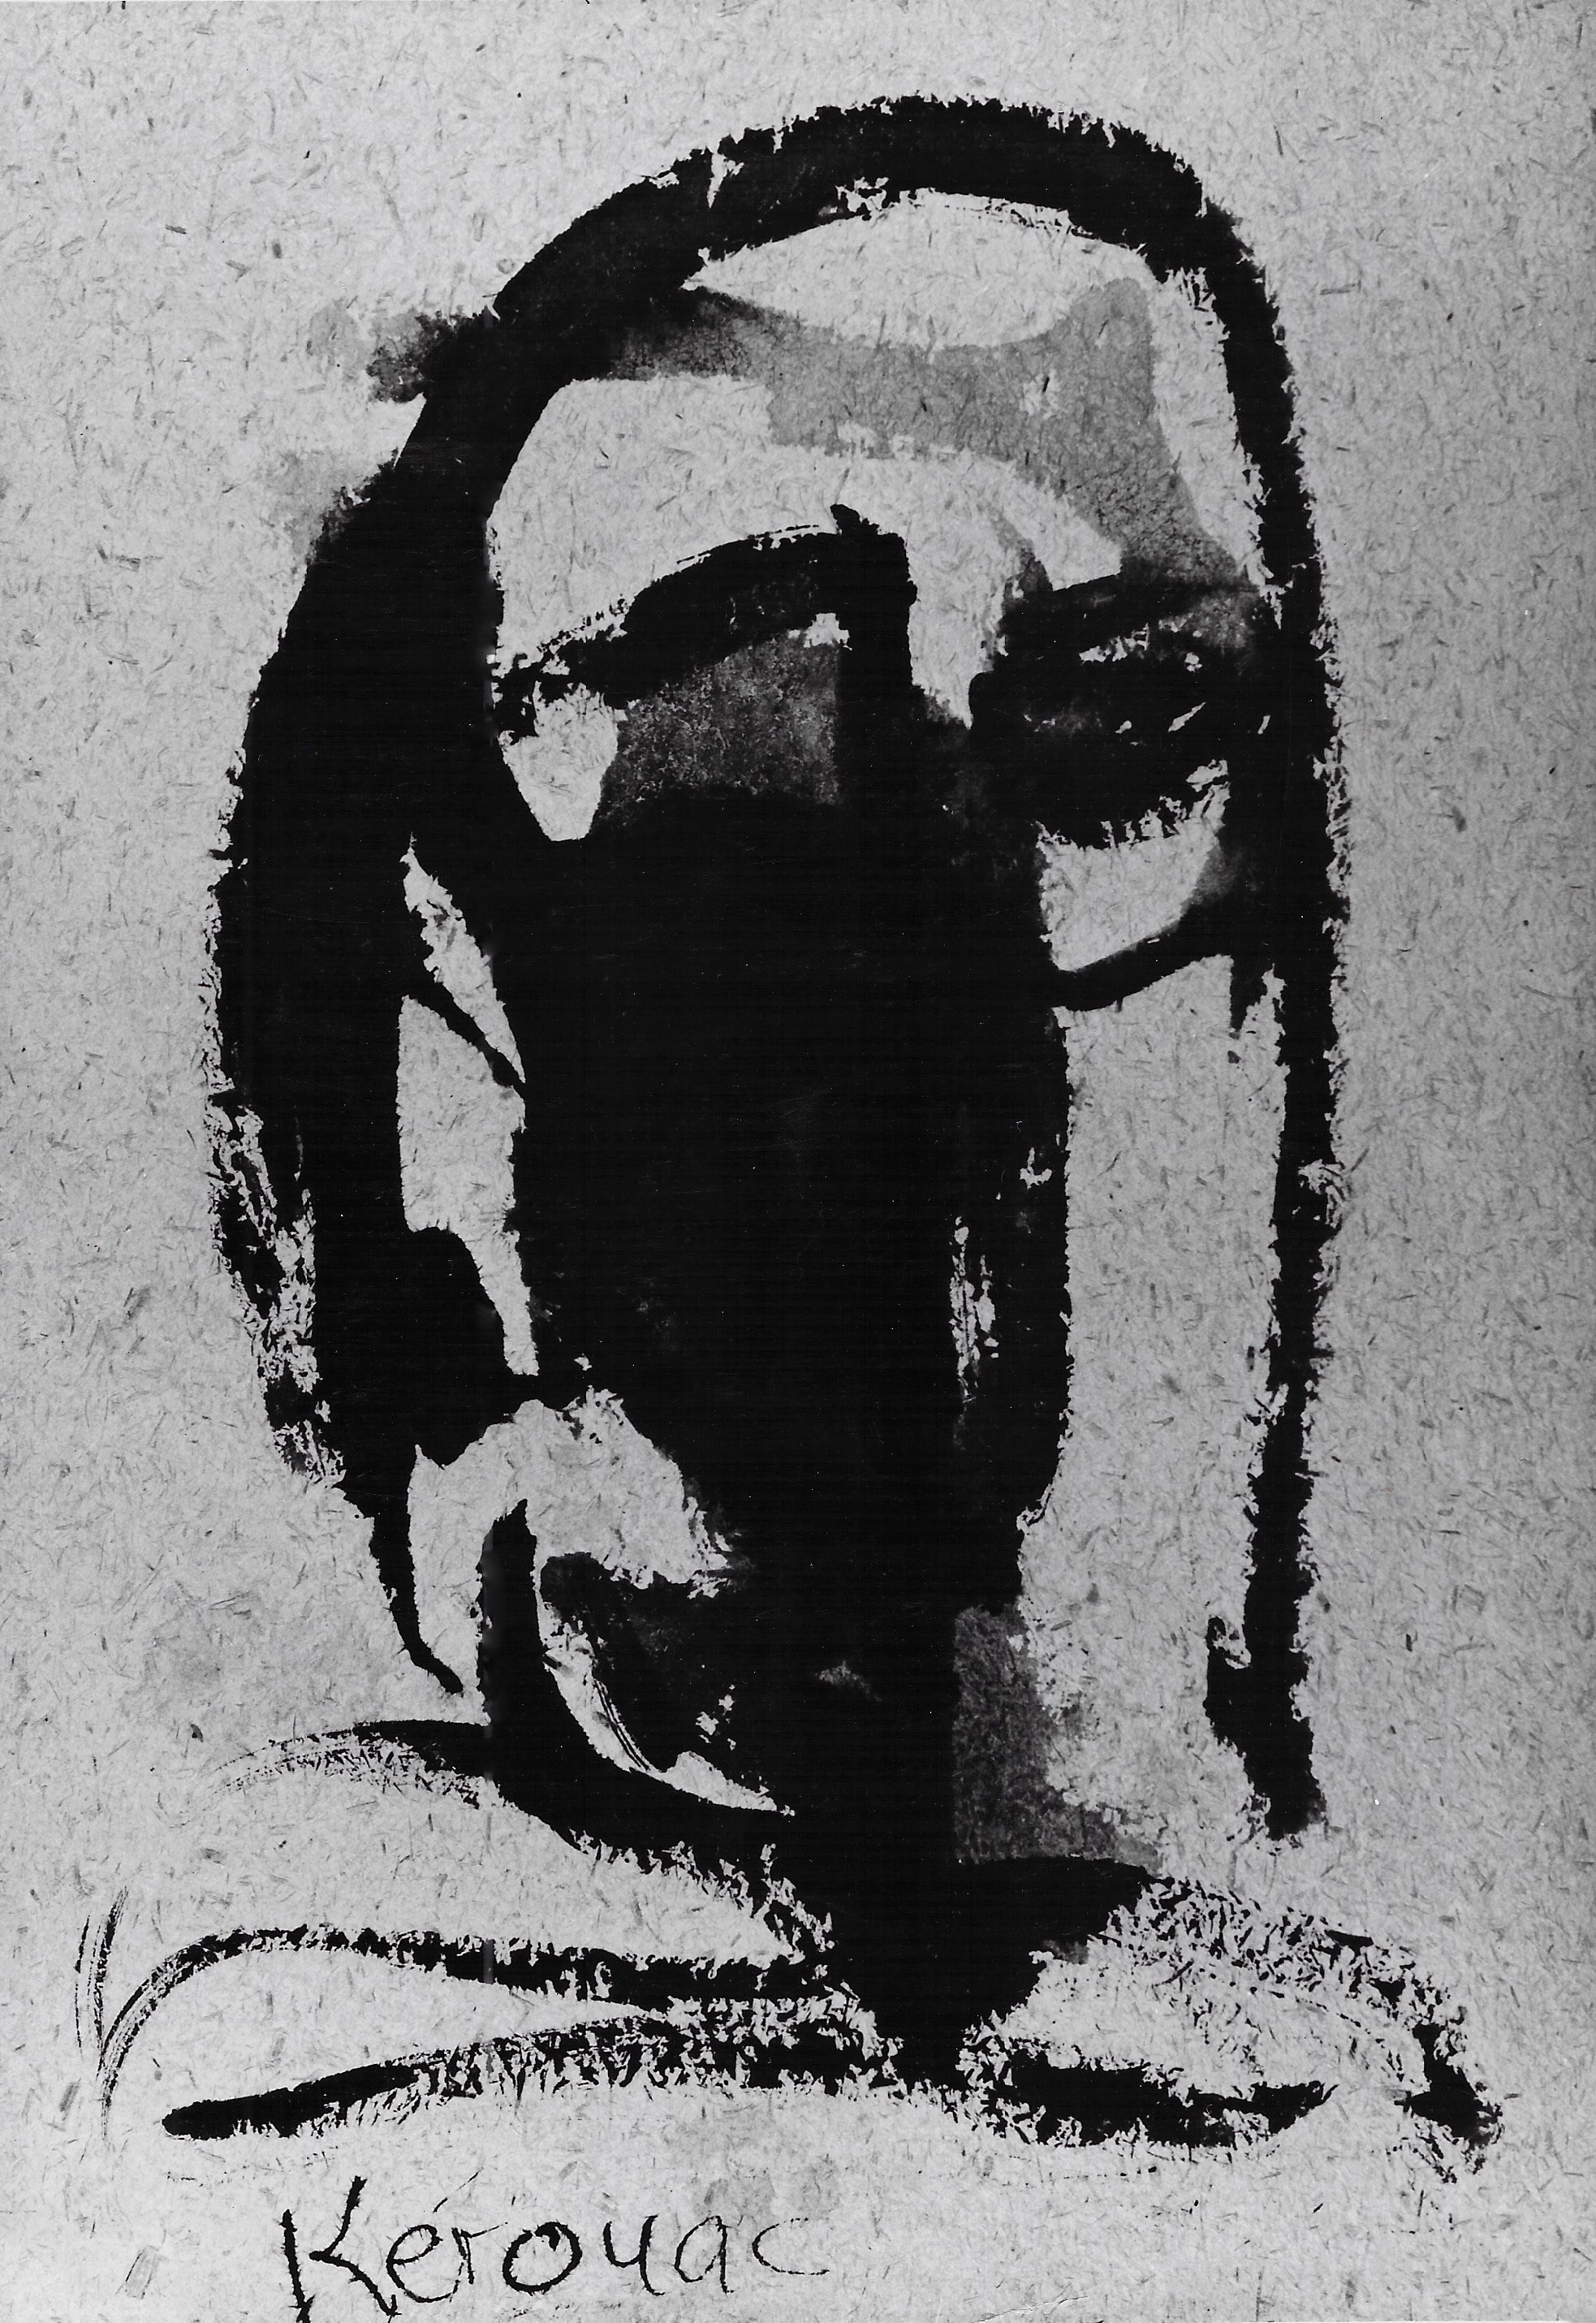 Portrait of Kanemitsu , Jack Kerouac, ink on paper, 1962.